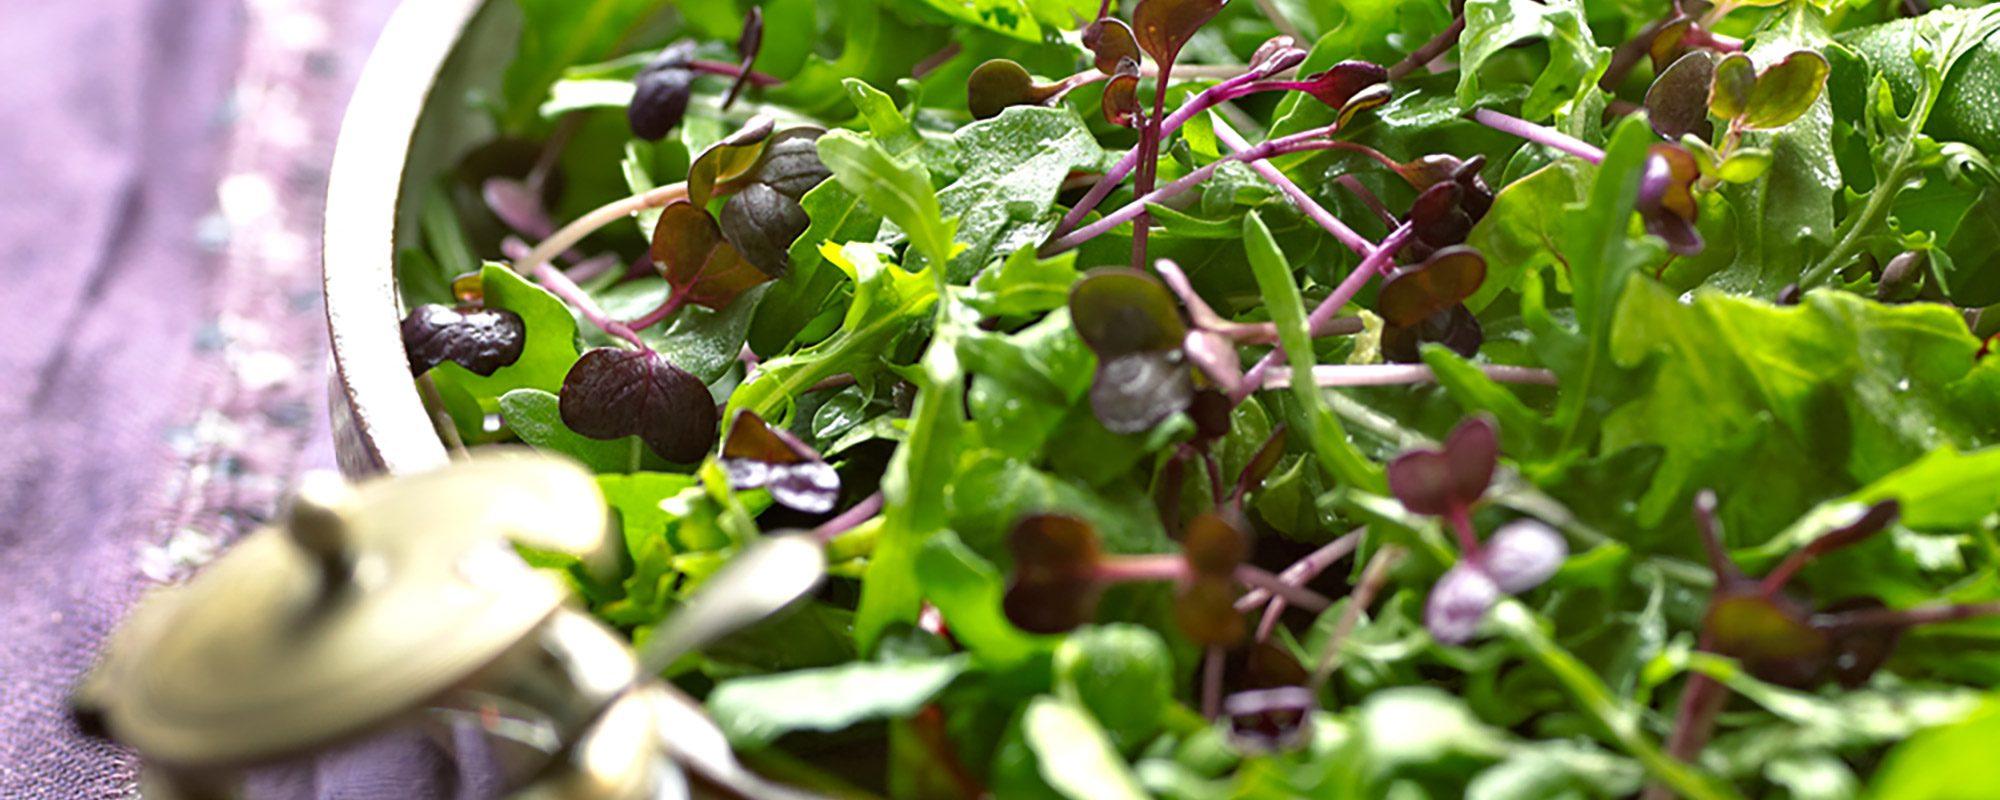 Fresh salad with microgreens